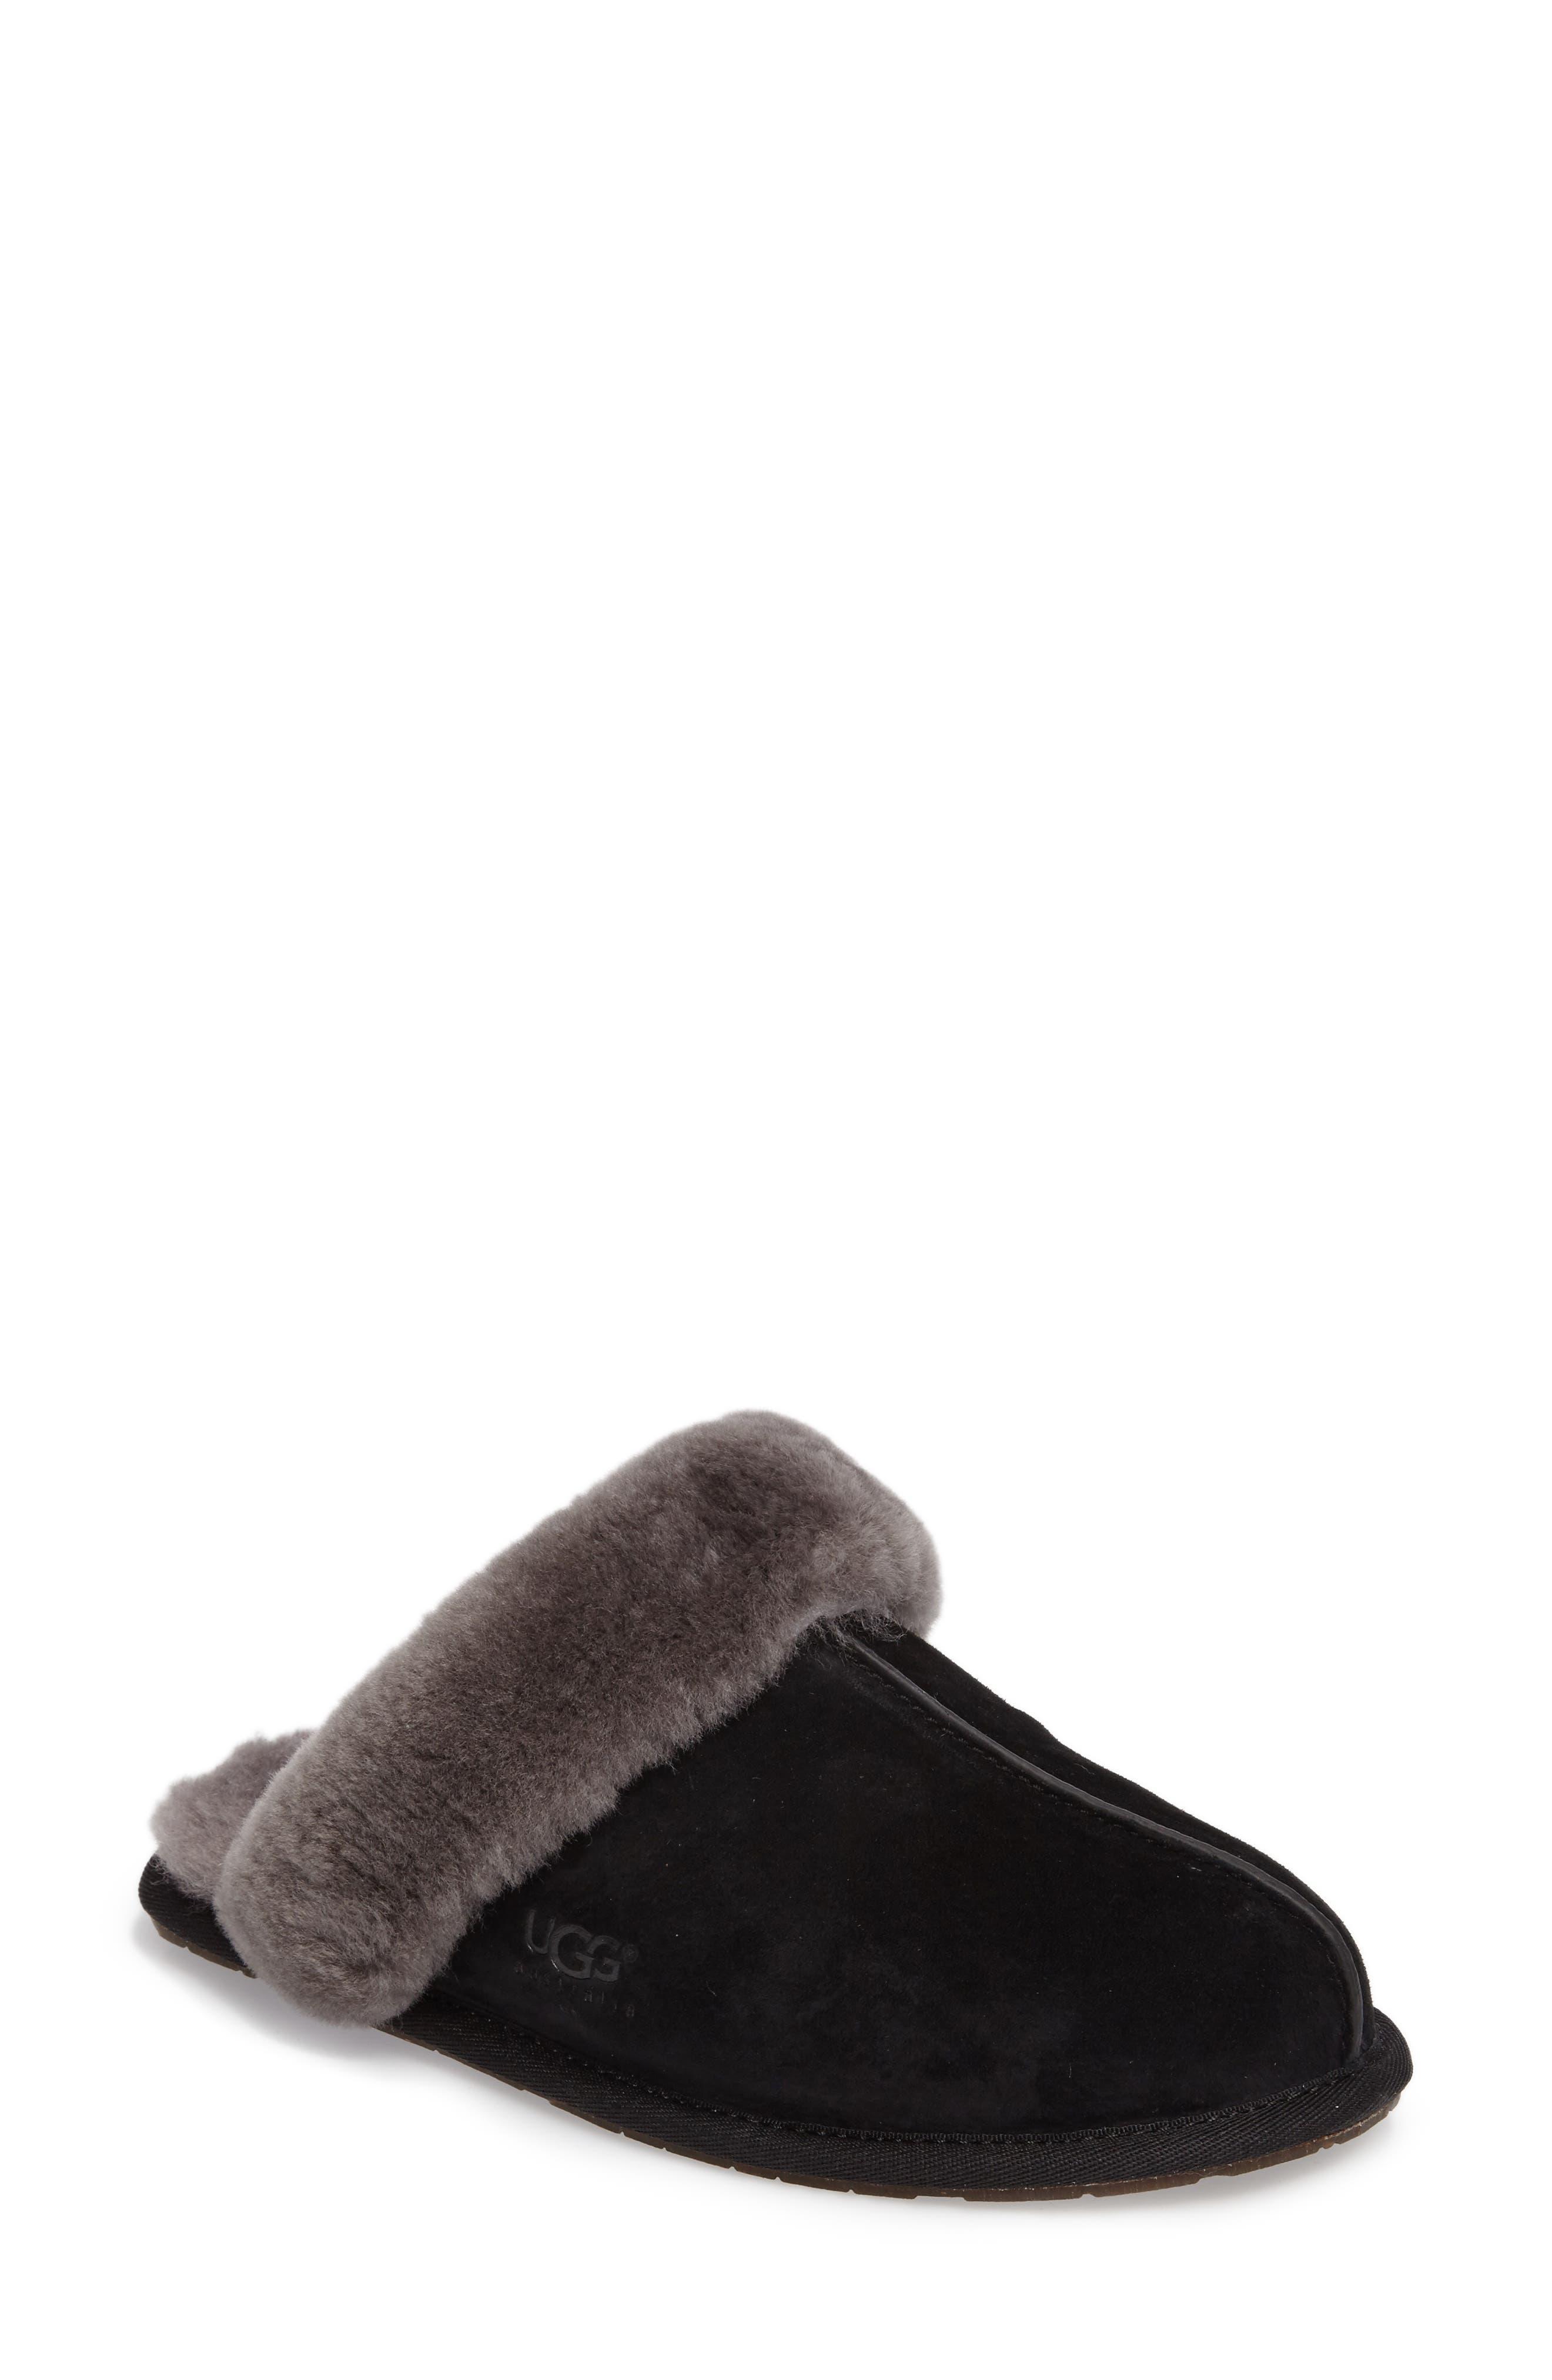 Ugg Scuffette Ii Water Resistant Slipper, Black